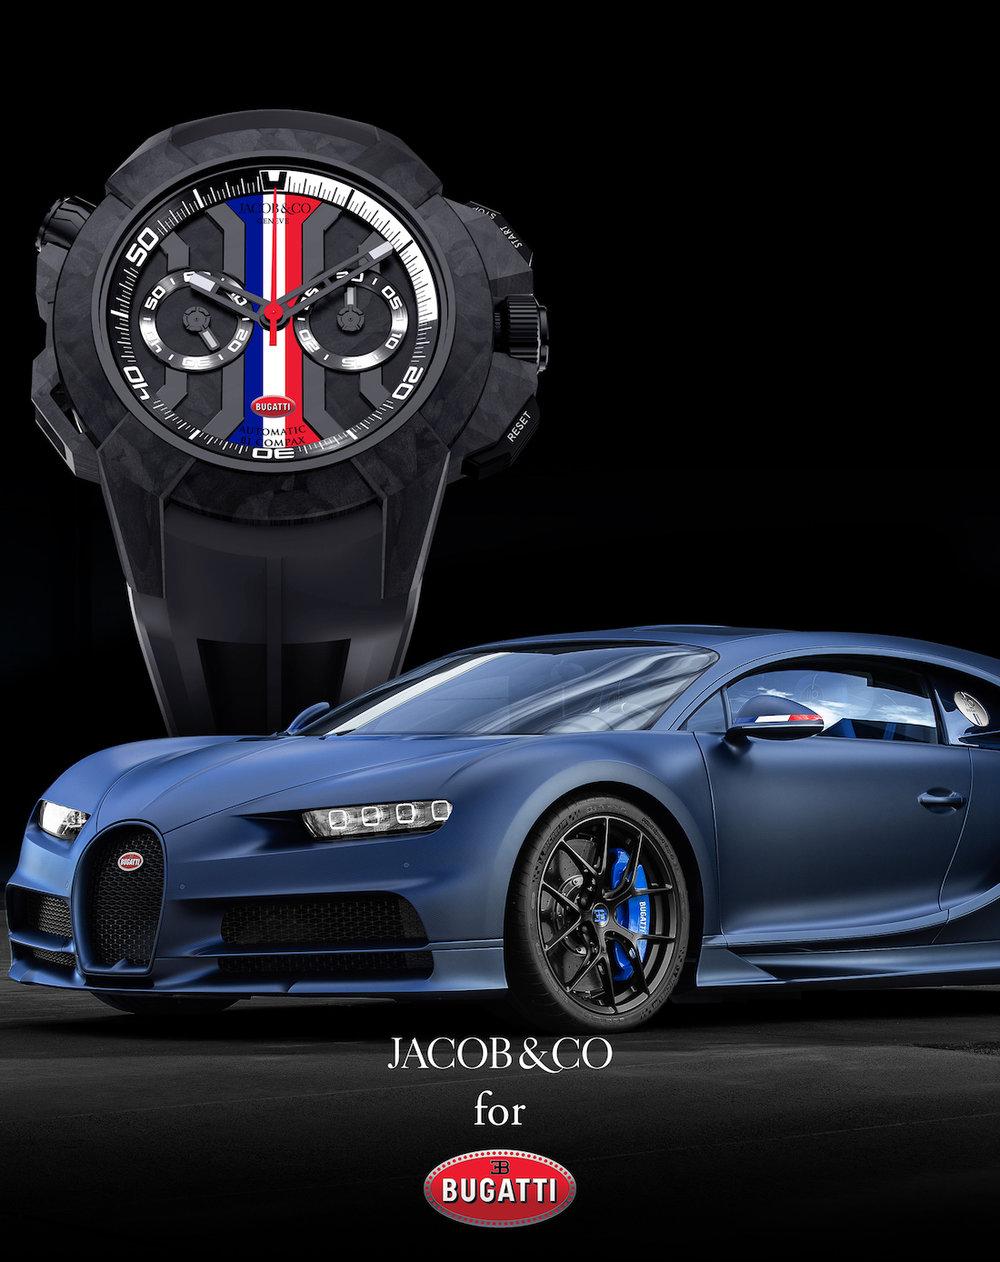 Epic X Chrono Bugatti Ad.jpg